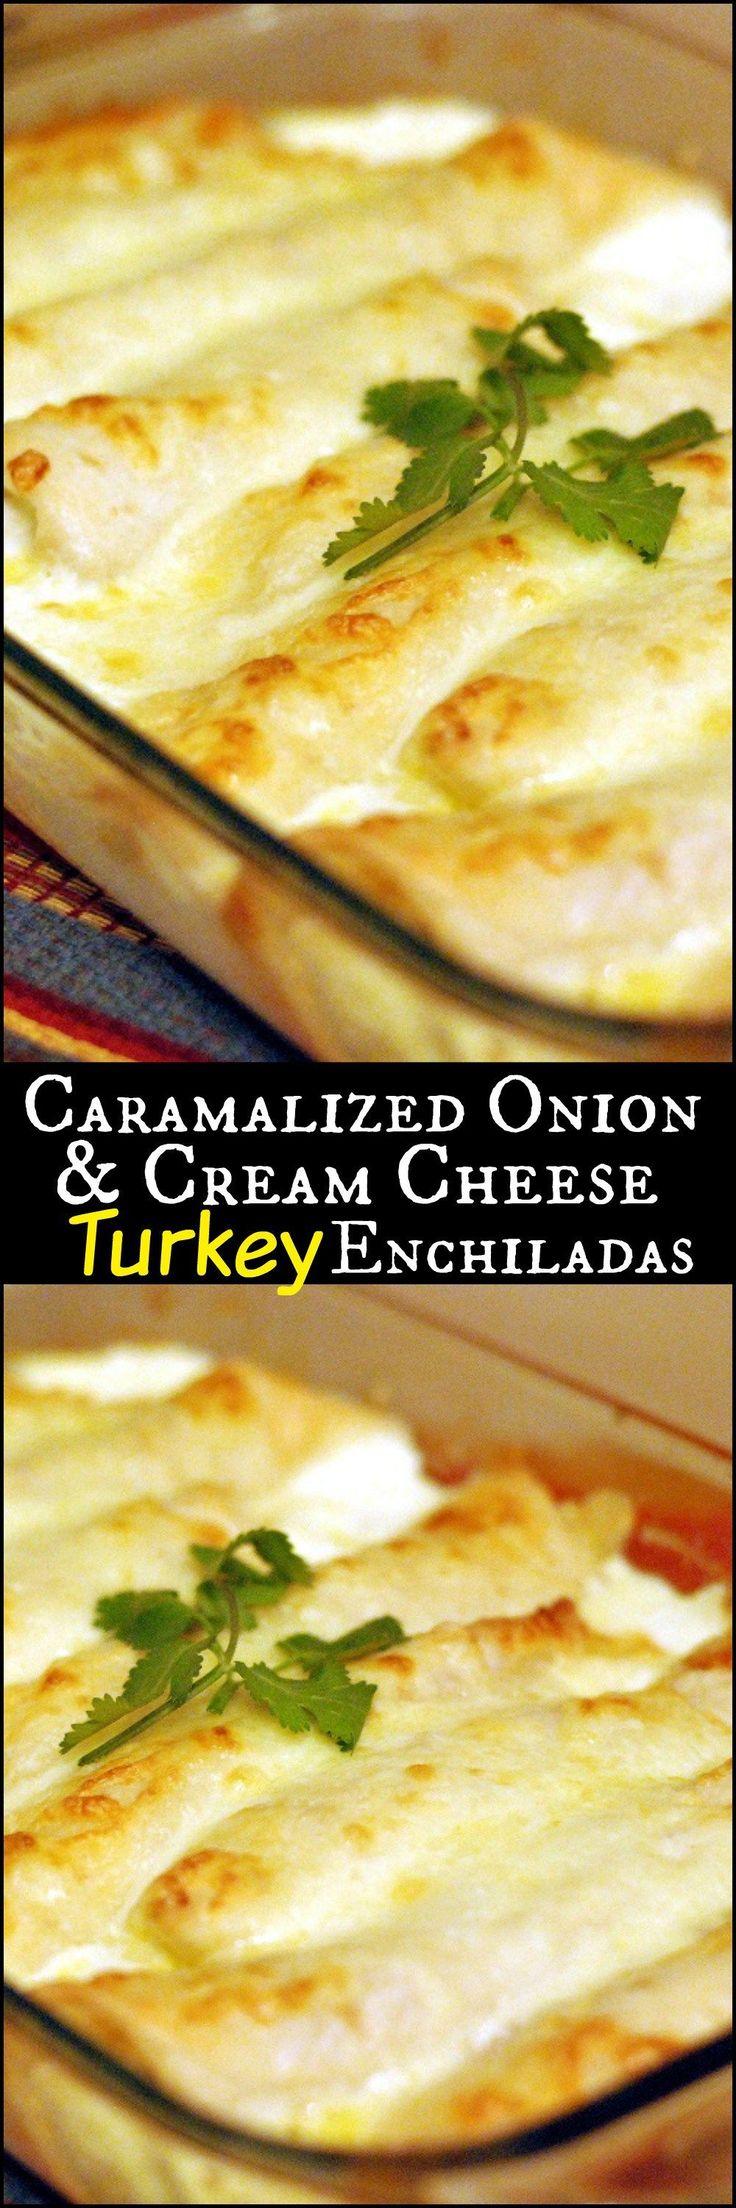 Caramelized Onion & Cream Cheese Turkey Enchiladas | Aunt Bee's Recipes